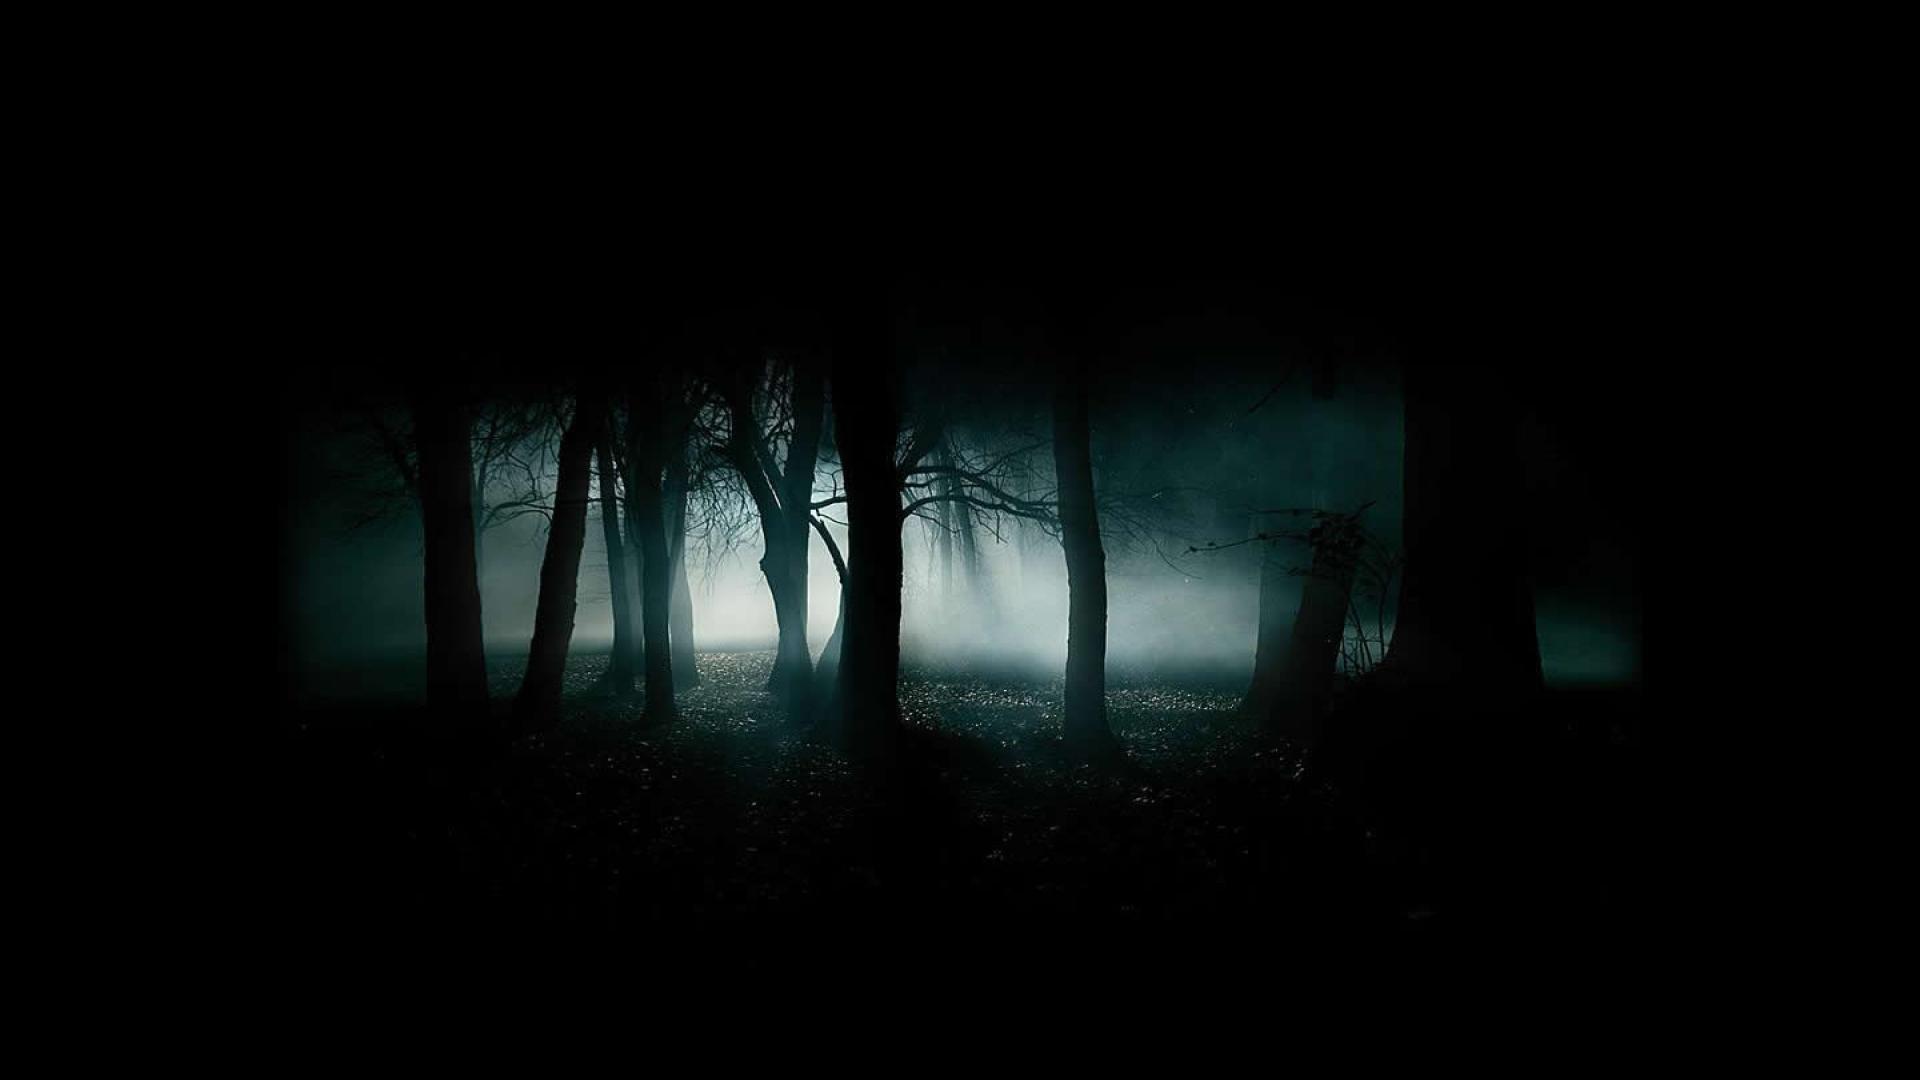 Scary Woods Desktop Background HD Wallpaper – Beraplan.